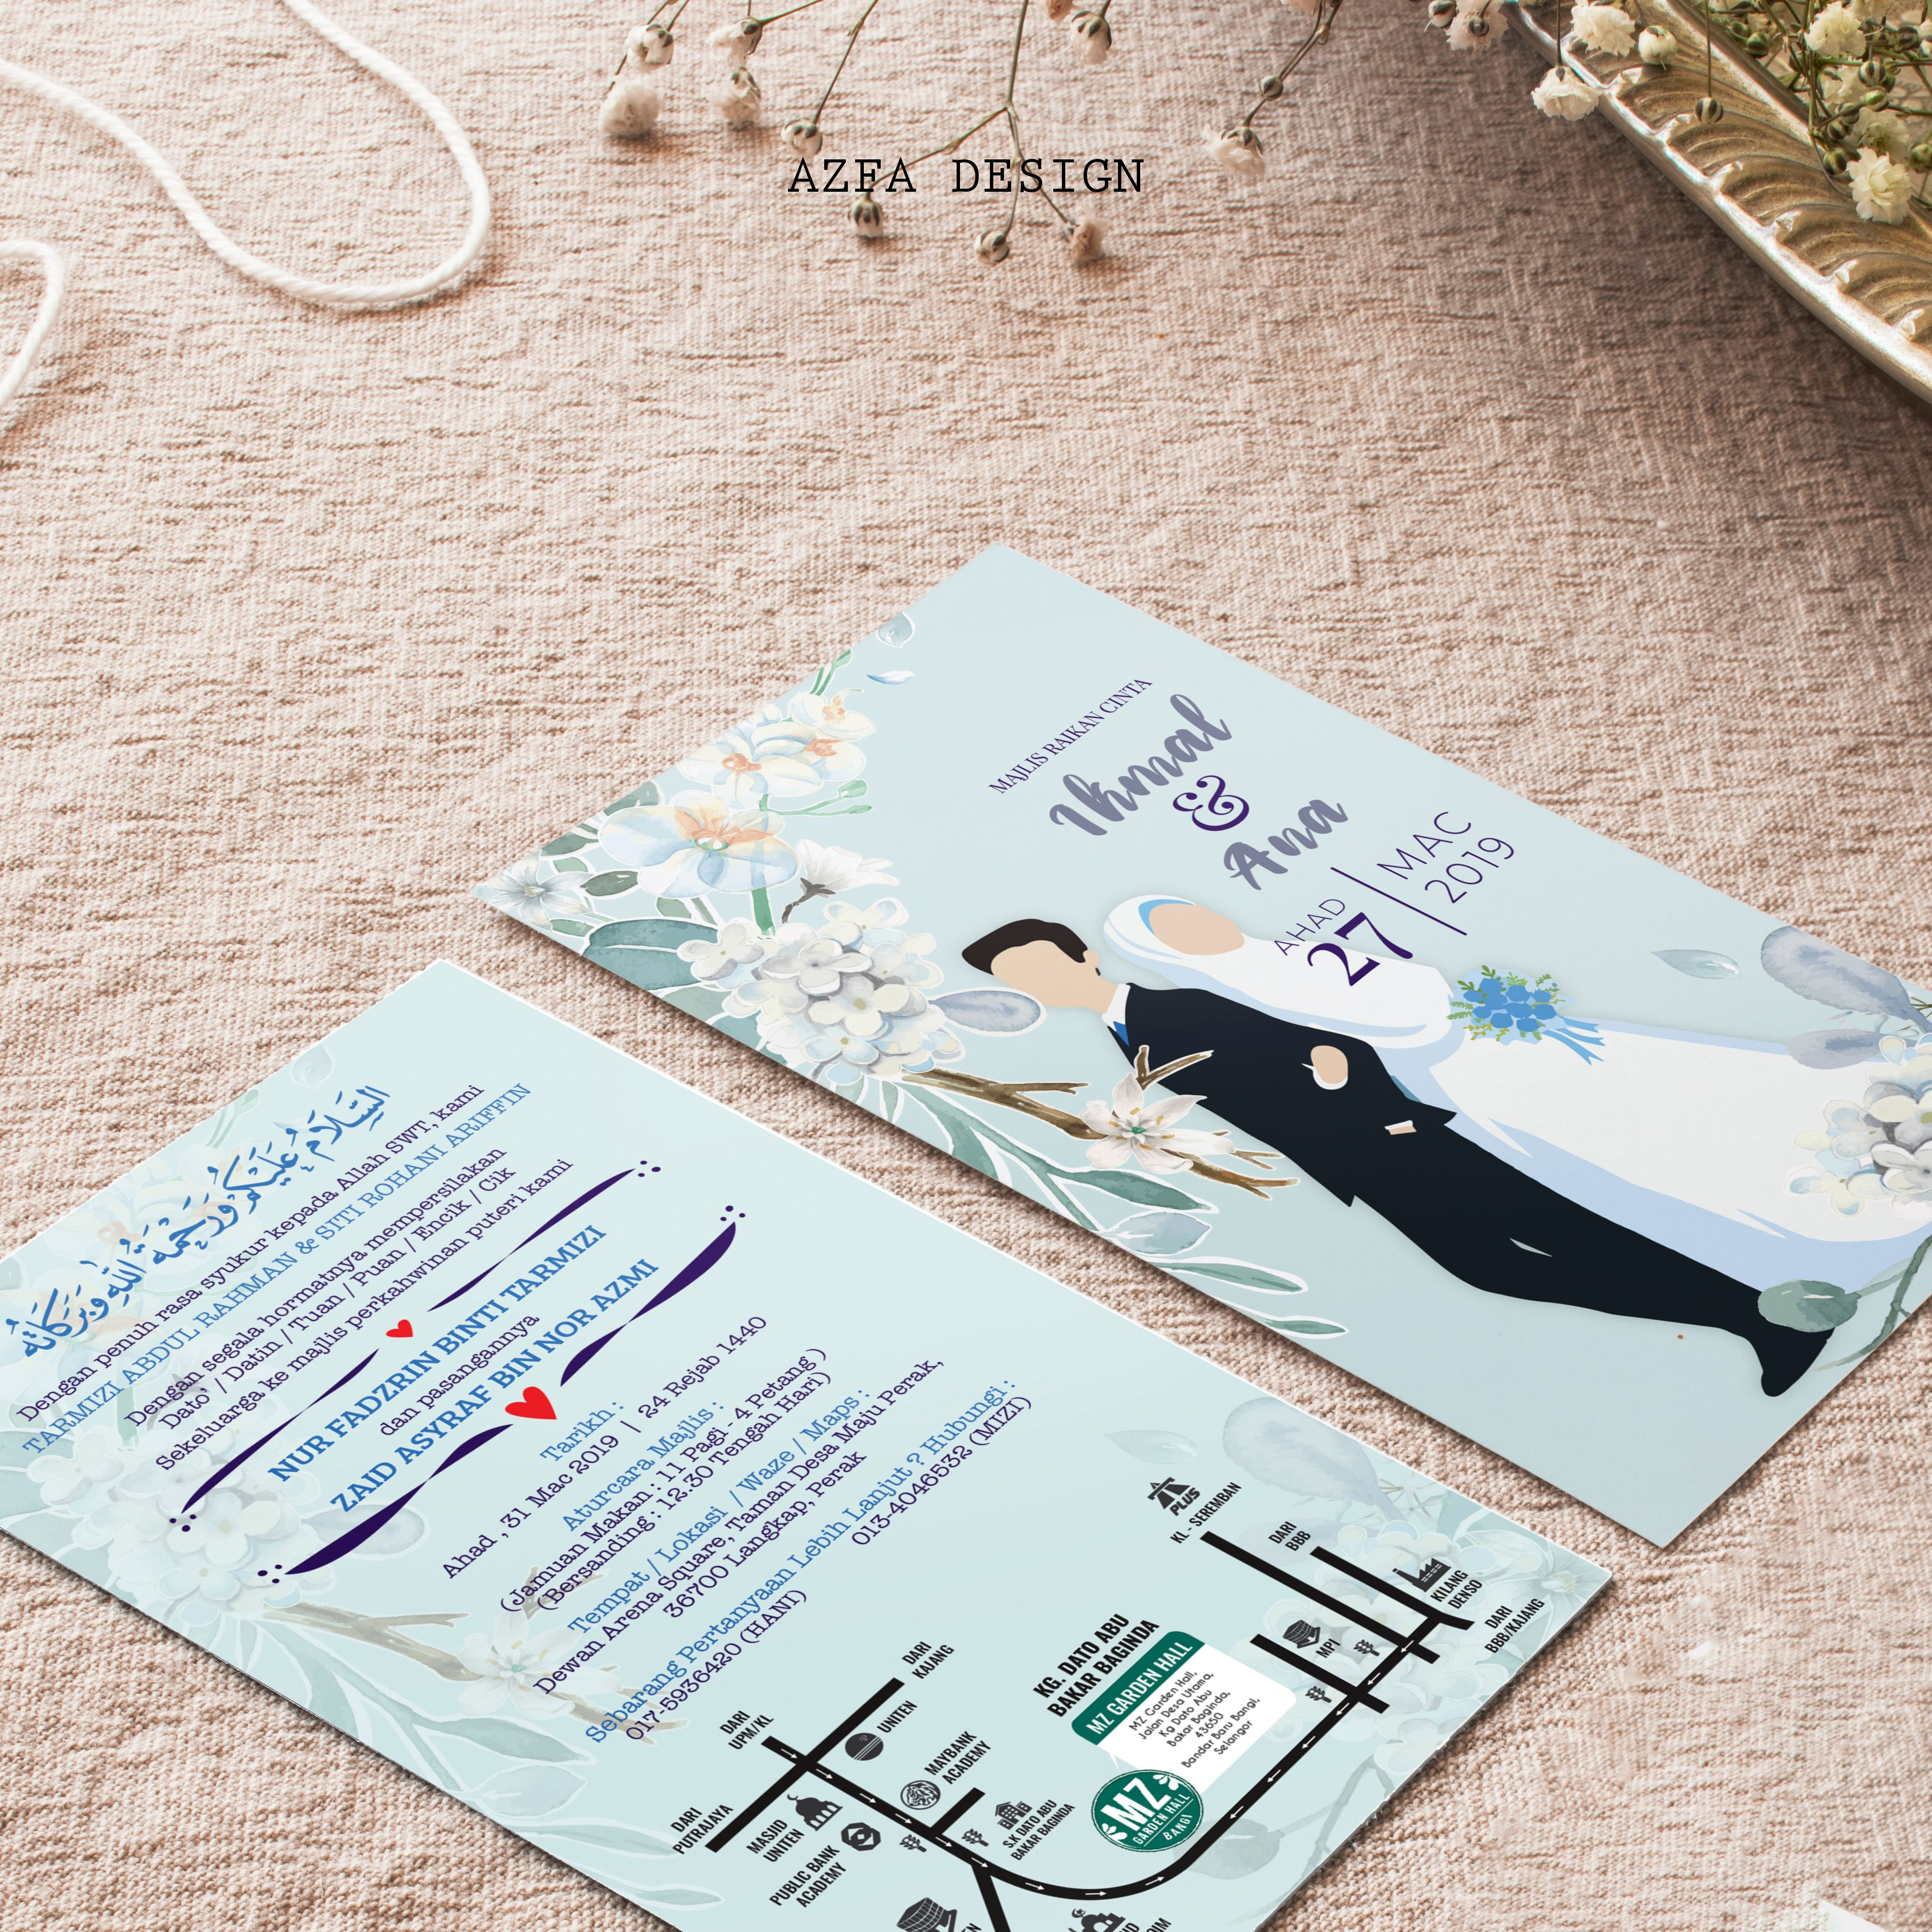 Azfadesign Kadkahwin Makin Simple Design Kad Kahwin Tu Makin Unik Sebenarnya Kan Bak Kata Oang Puteh Simple Is The B Invitation Cards Cards Invitations